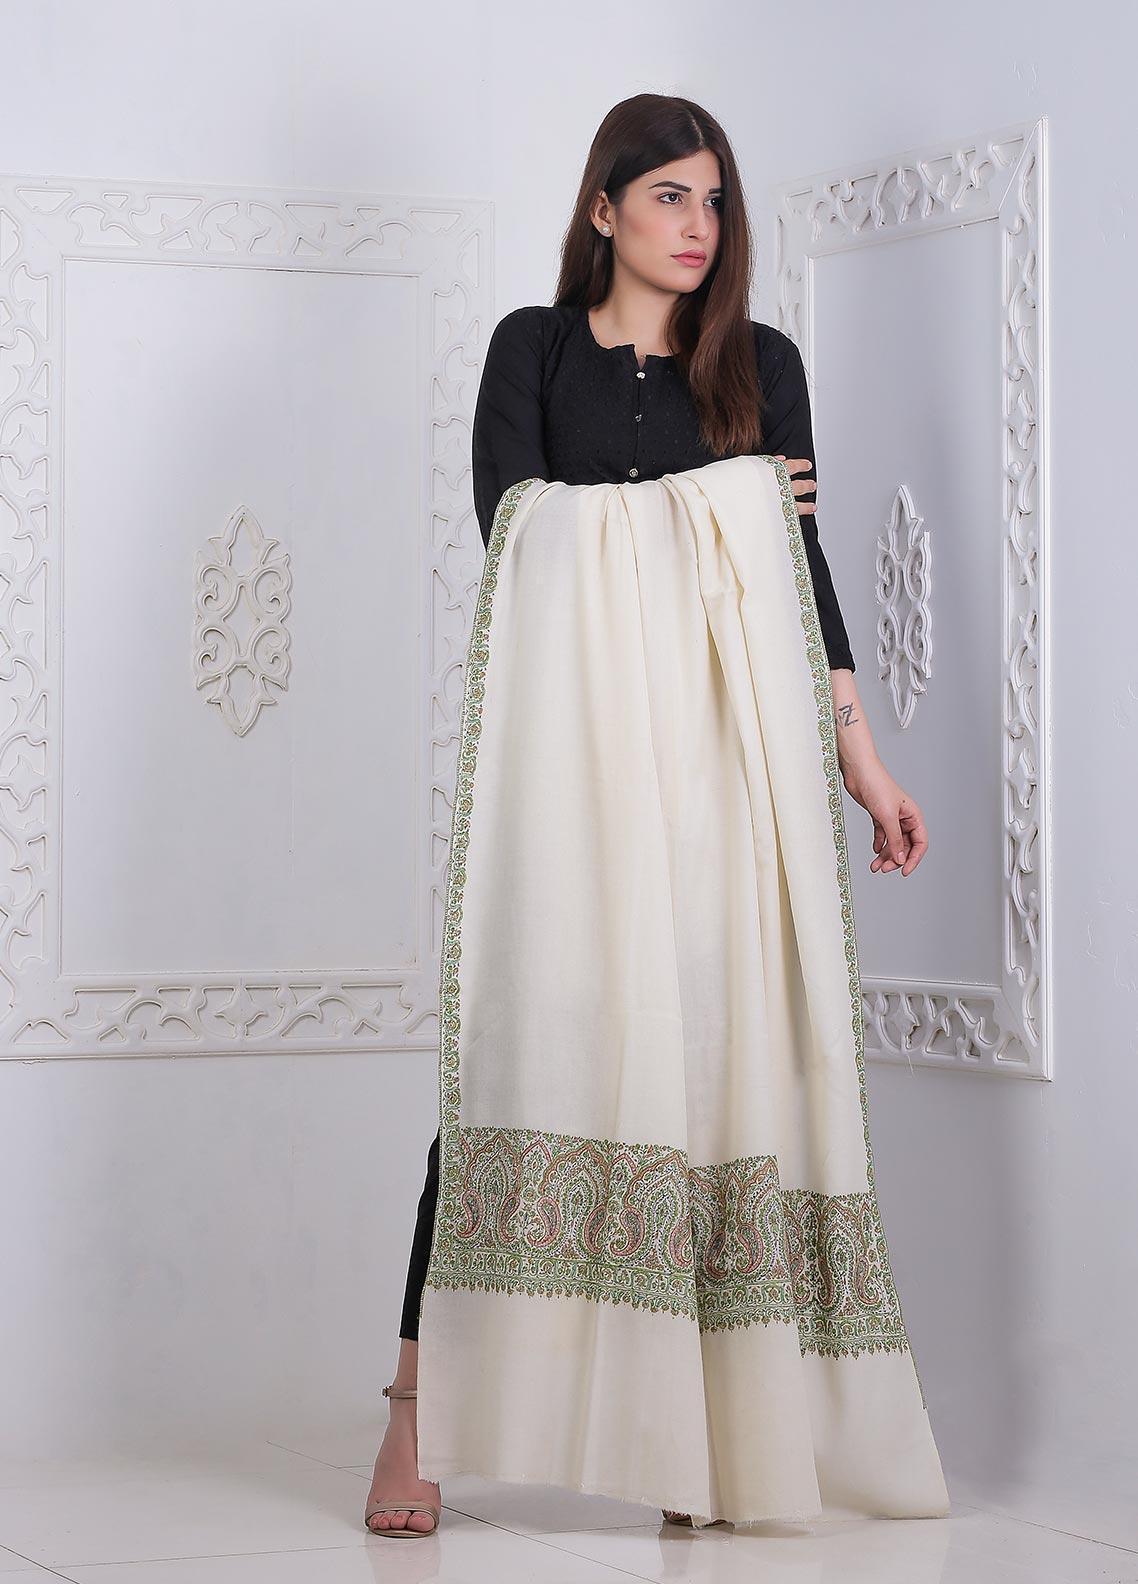 Sanaulla Exclusive Range Embroidered Pashmina  Shawl AKP-25 Off/White - Pashmina Shawls